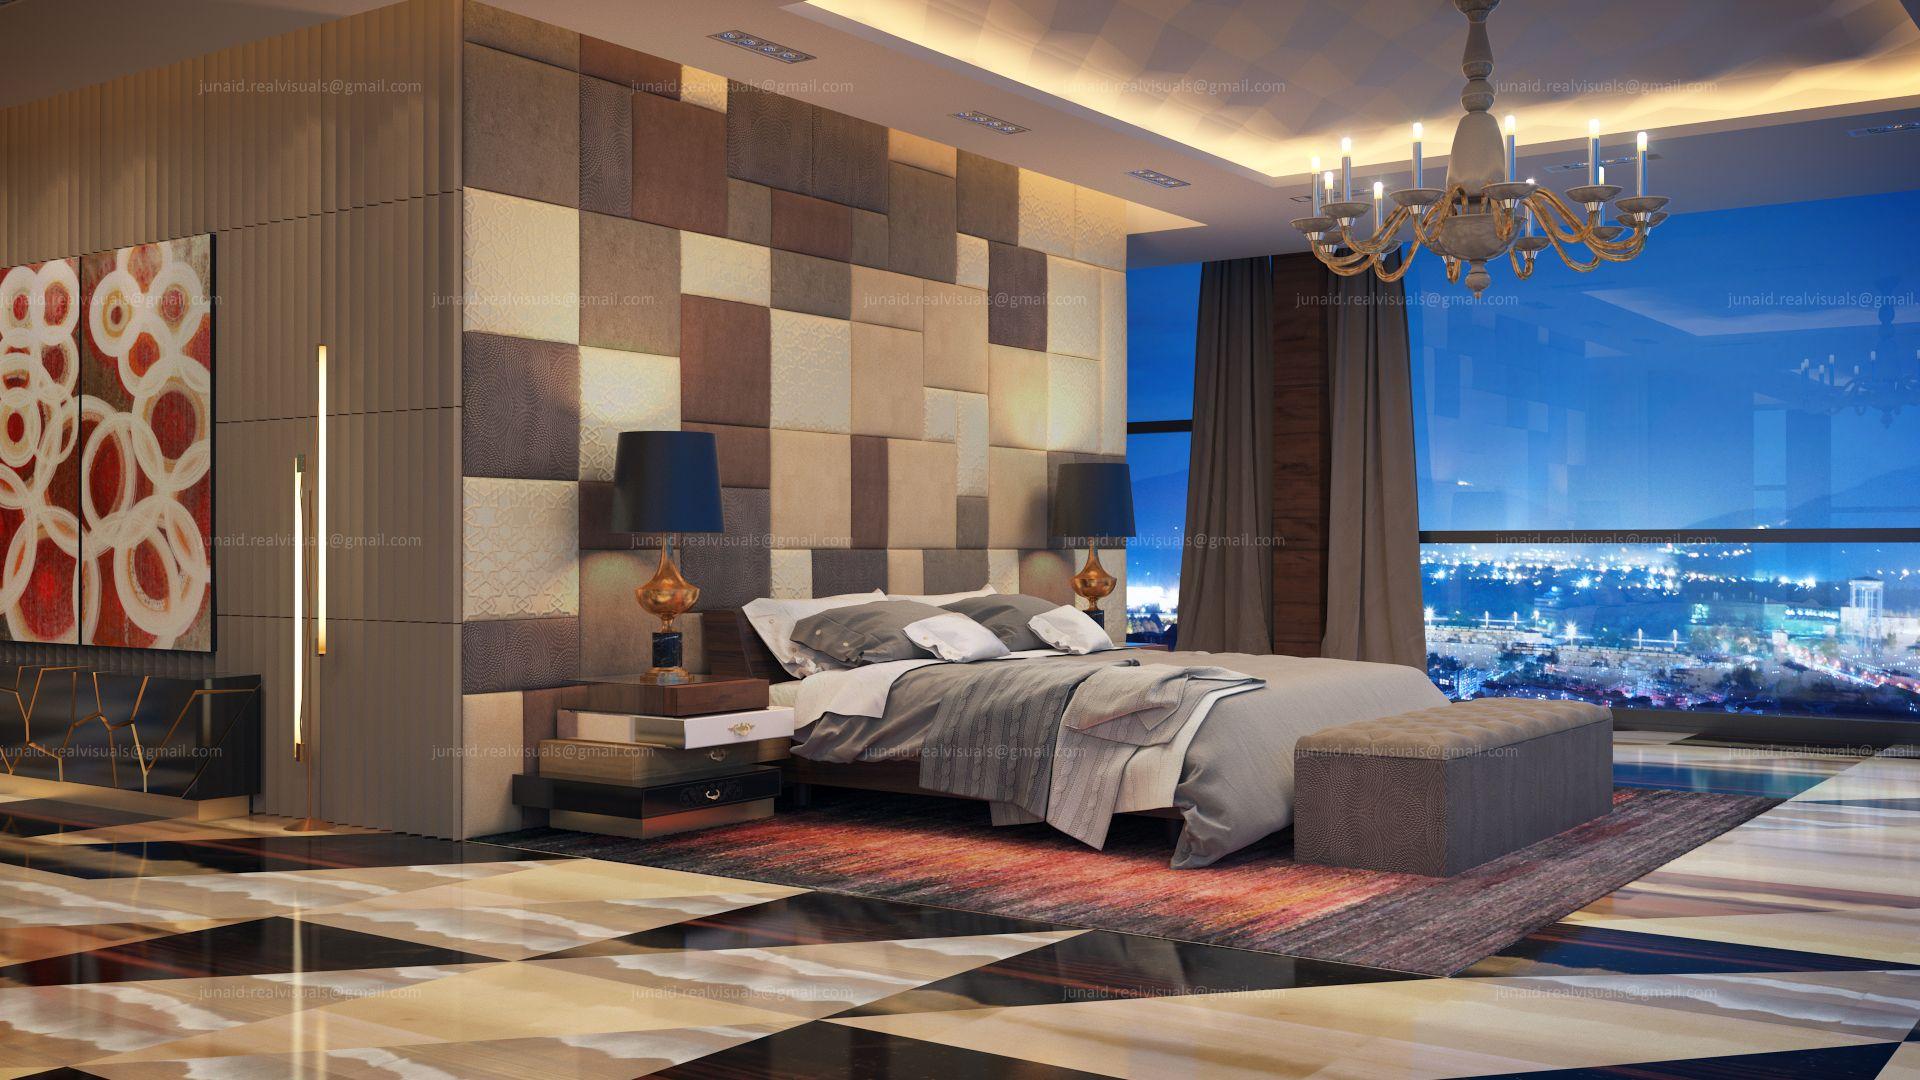 aareas rendering architectural design family interactive renderings interior